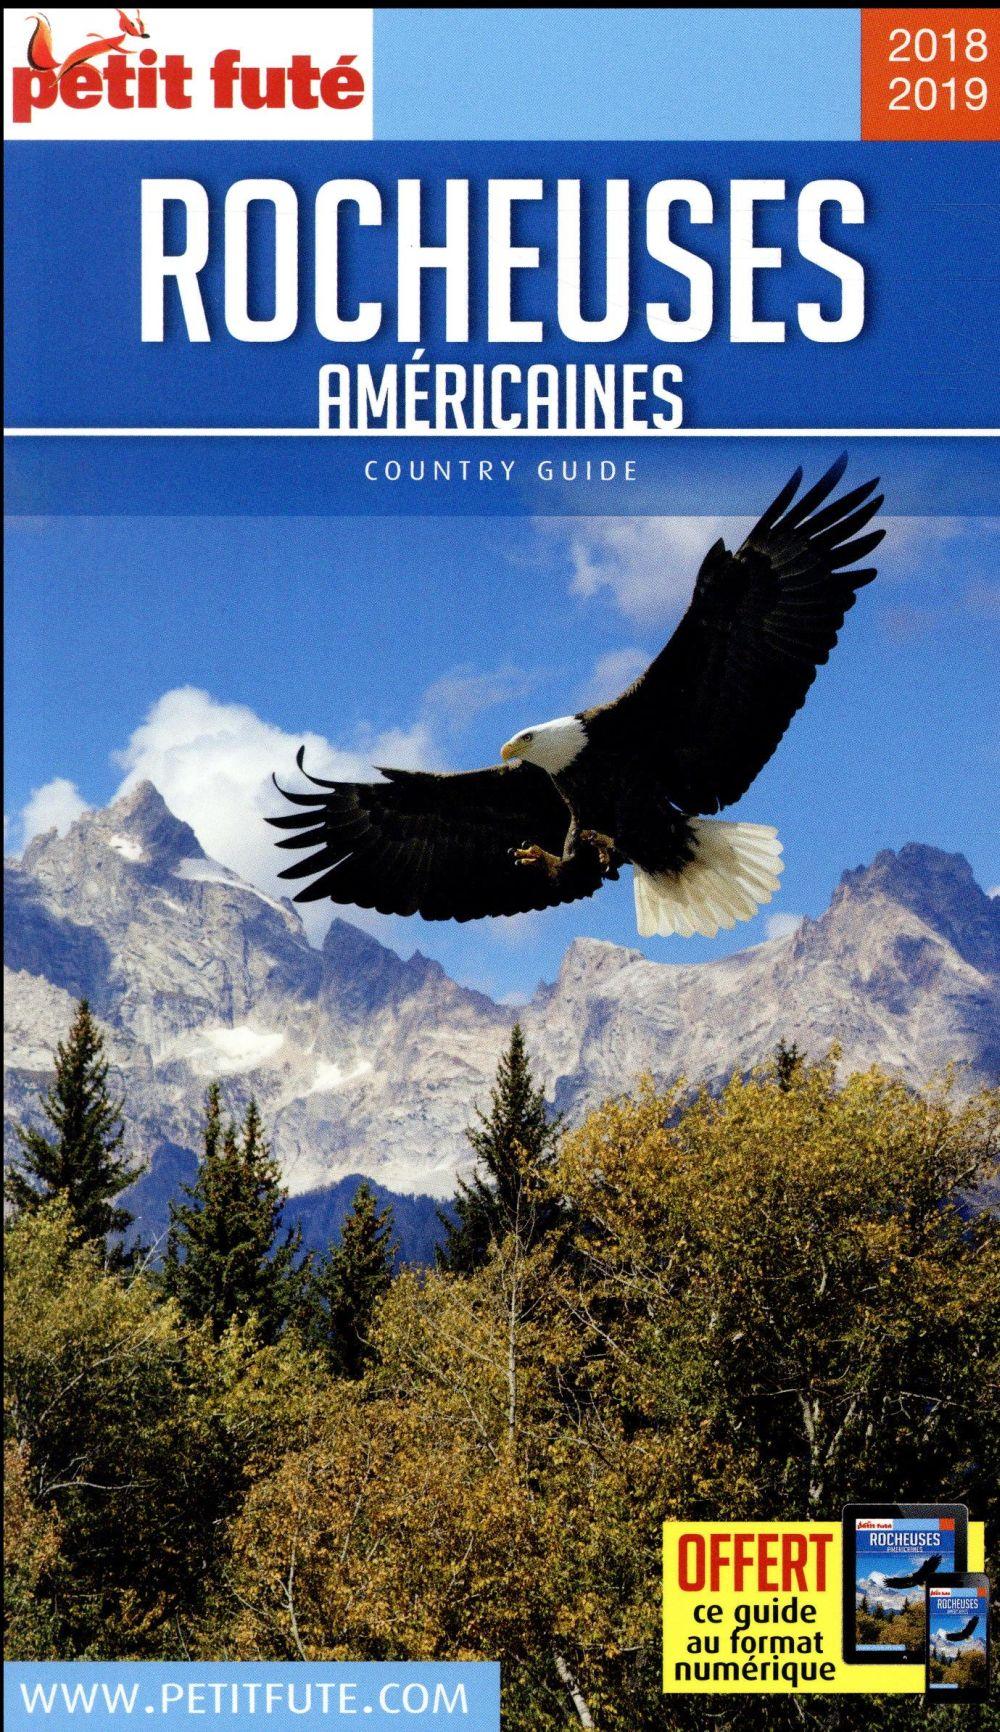 GUIDE PETIT FUTE ; COUNTRY GUIDE ; rocheuses américaines (édition 2018)